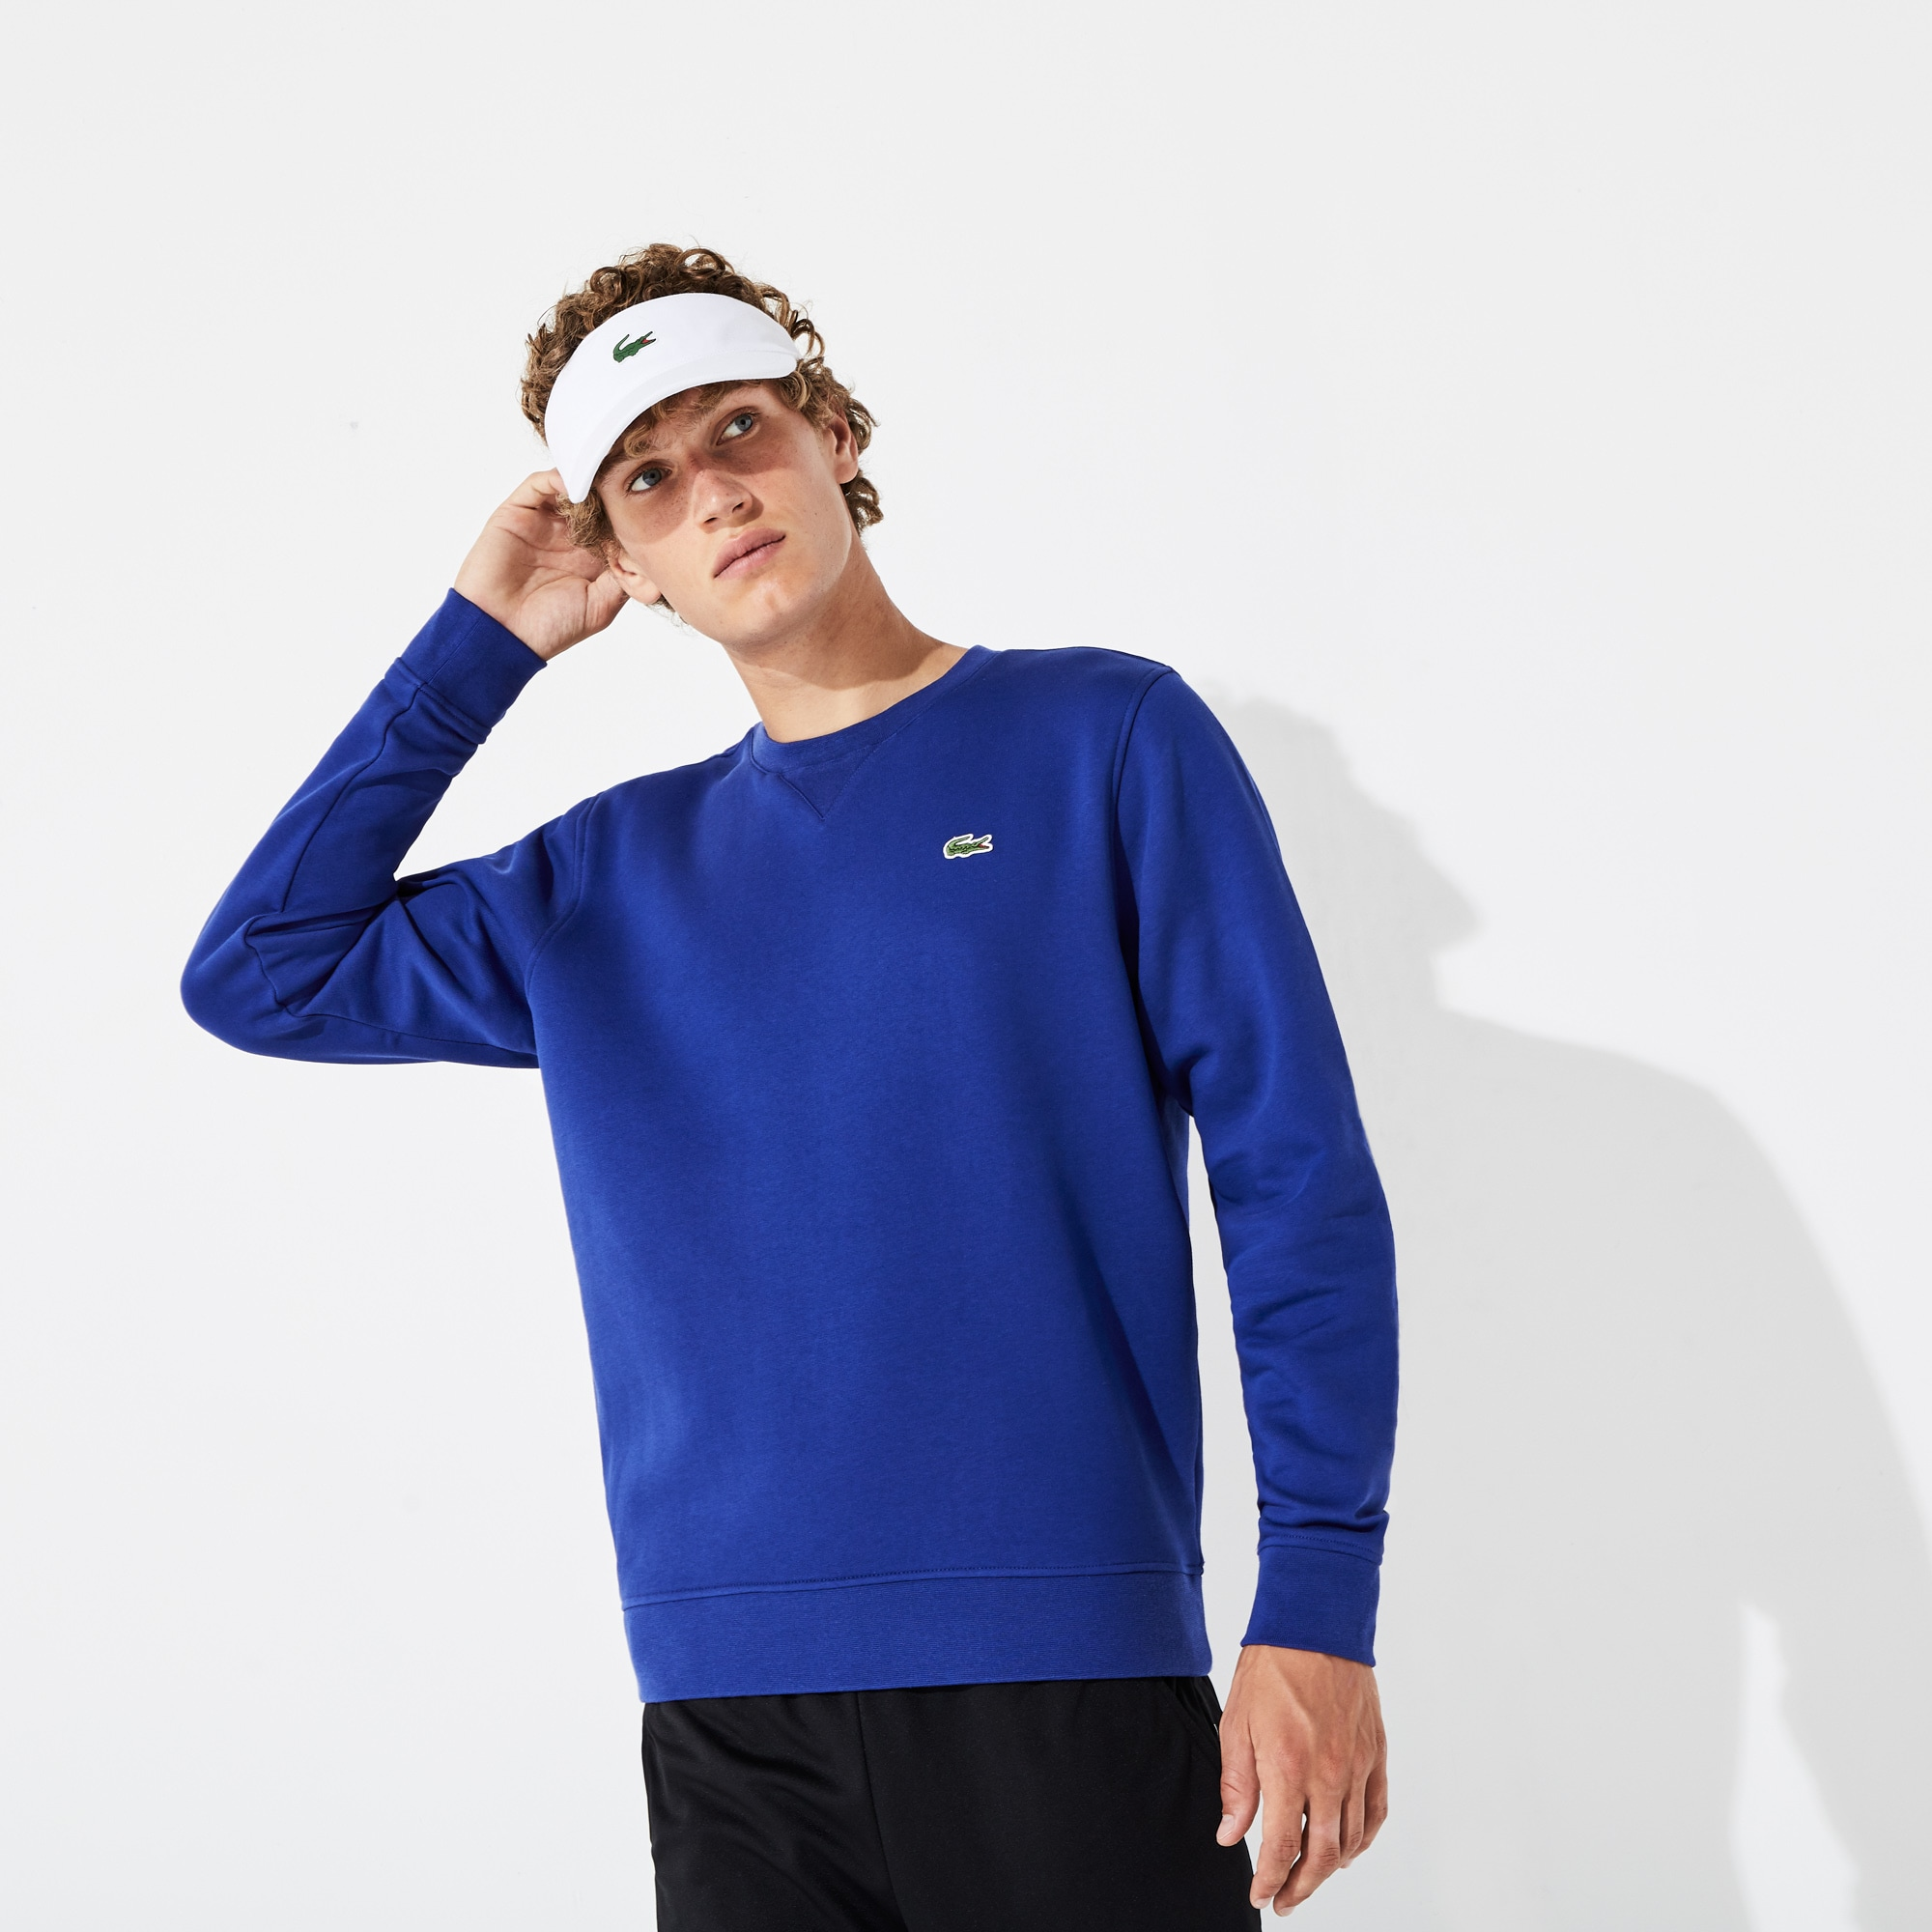 Marque Lacoste Sportswear Marque Lacoste Coloré Sportswear Homme c54jqAR3L